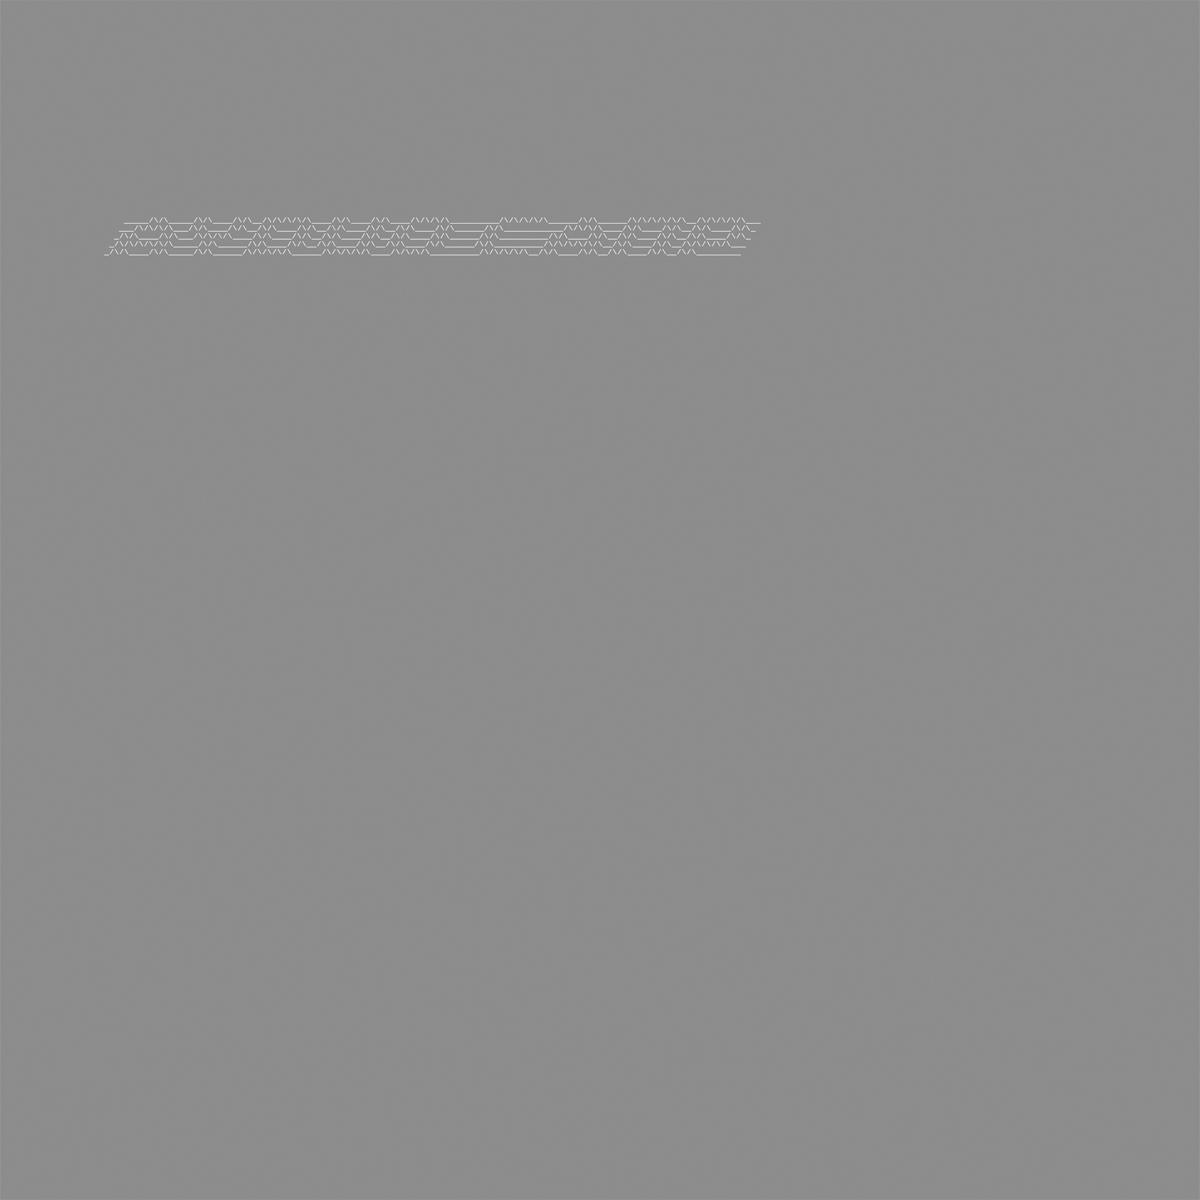 Kuzma Palkin/AUDIOSAPR DLP